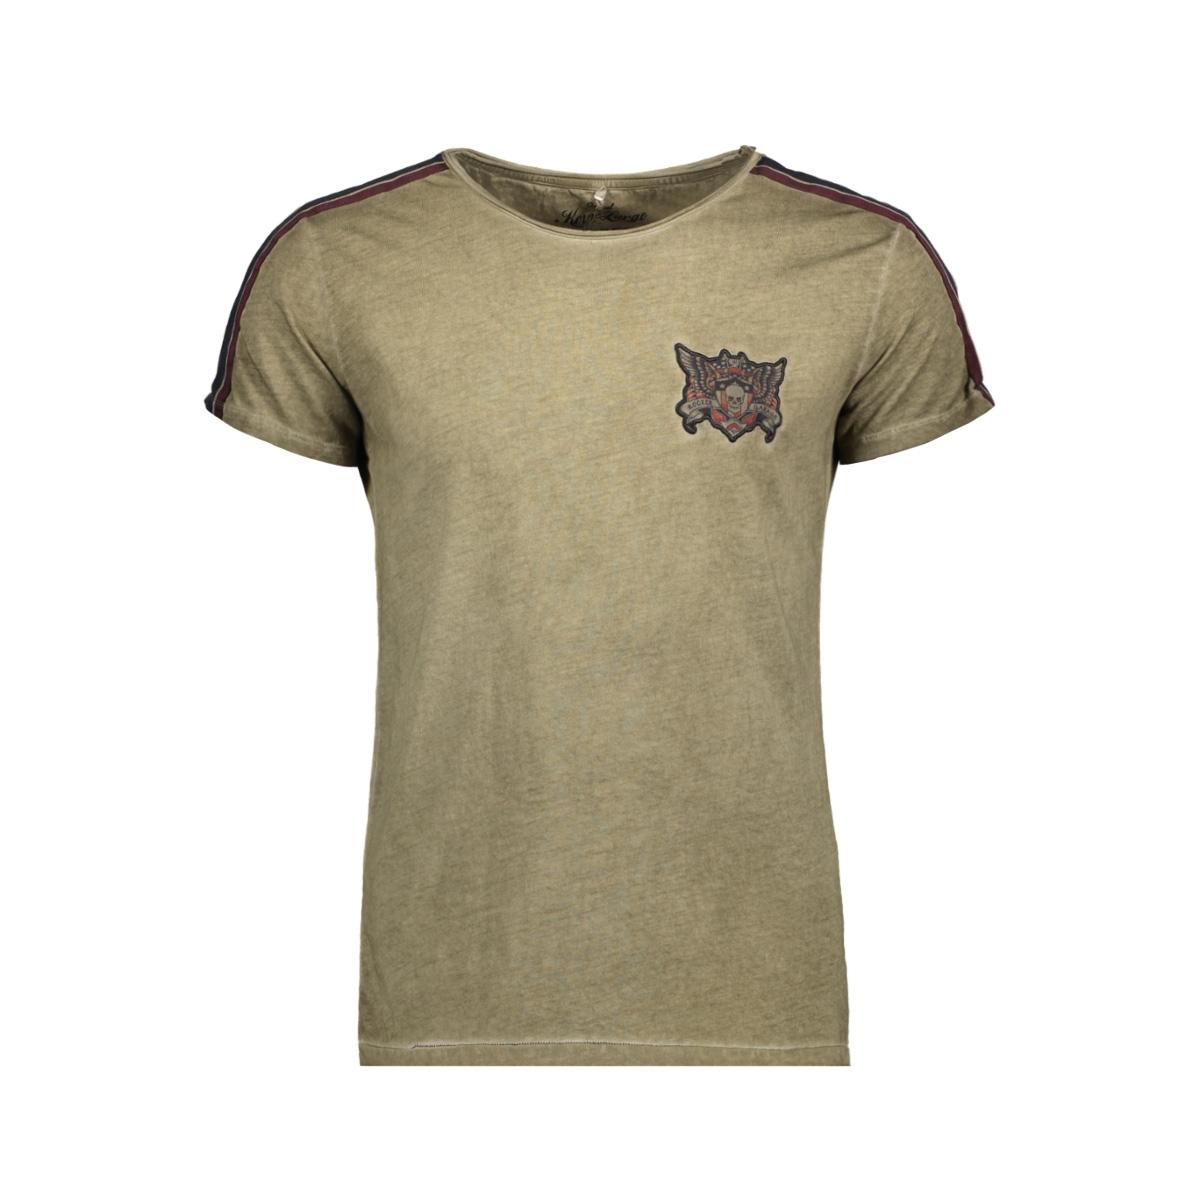 mt00163 key largo t-shirt 1502 mil green